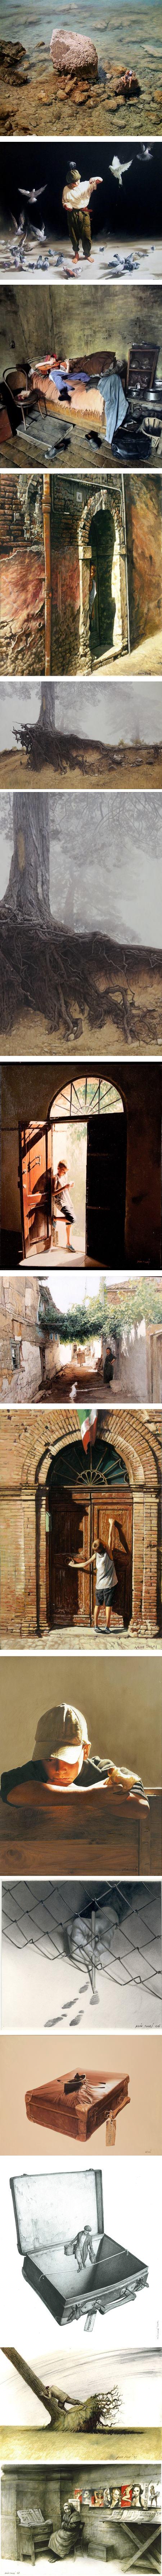 Agim Sulaj, realist paintings, editorial illustrations and cartoons